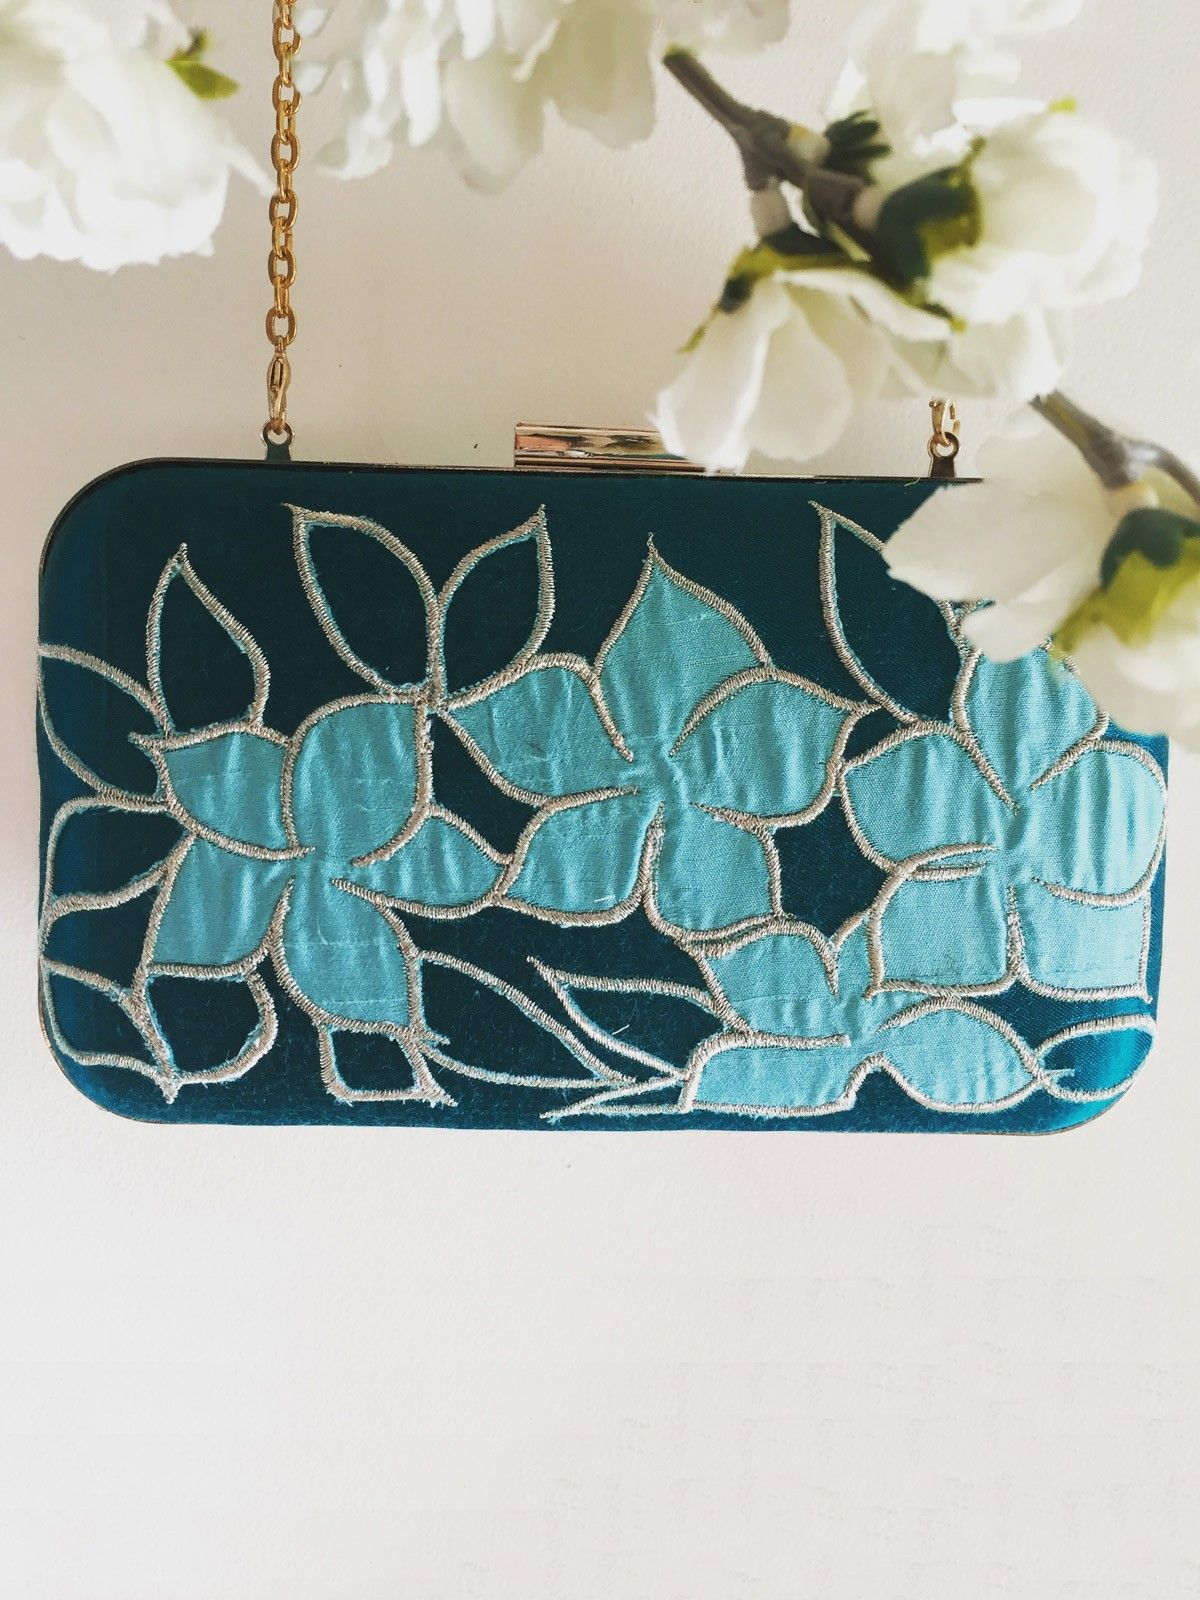 Indigo Blue handloom Ikat metal frame women's applique clutch